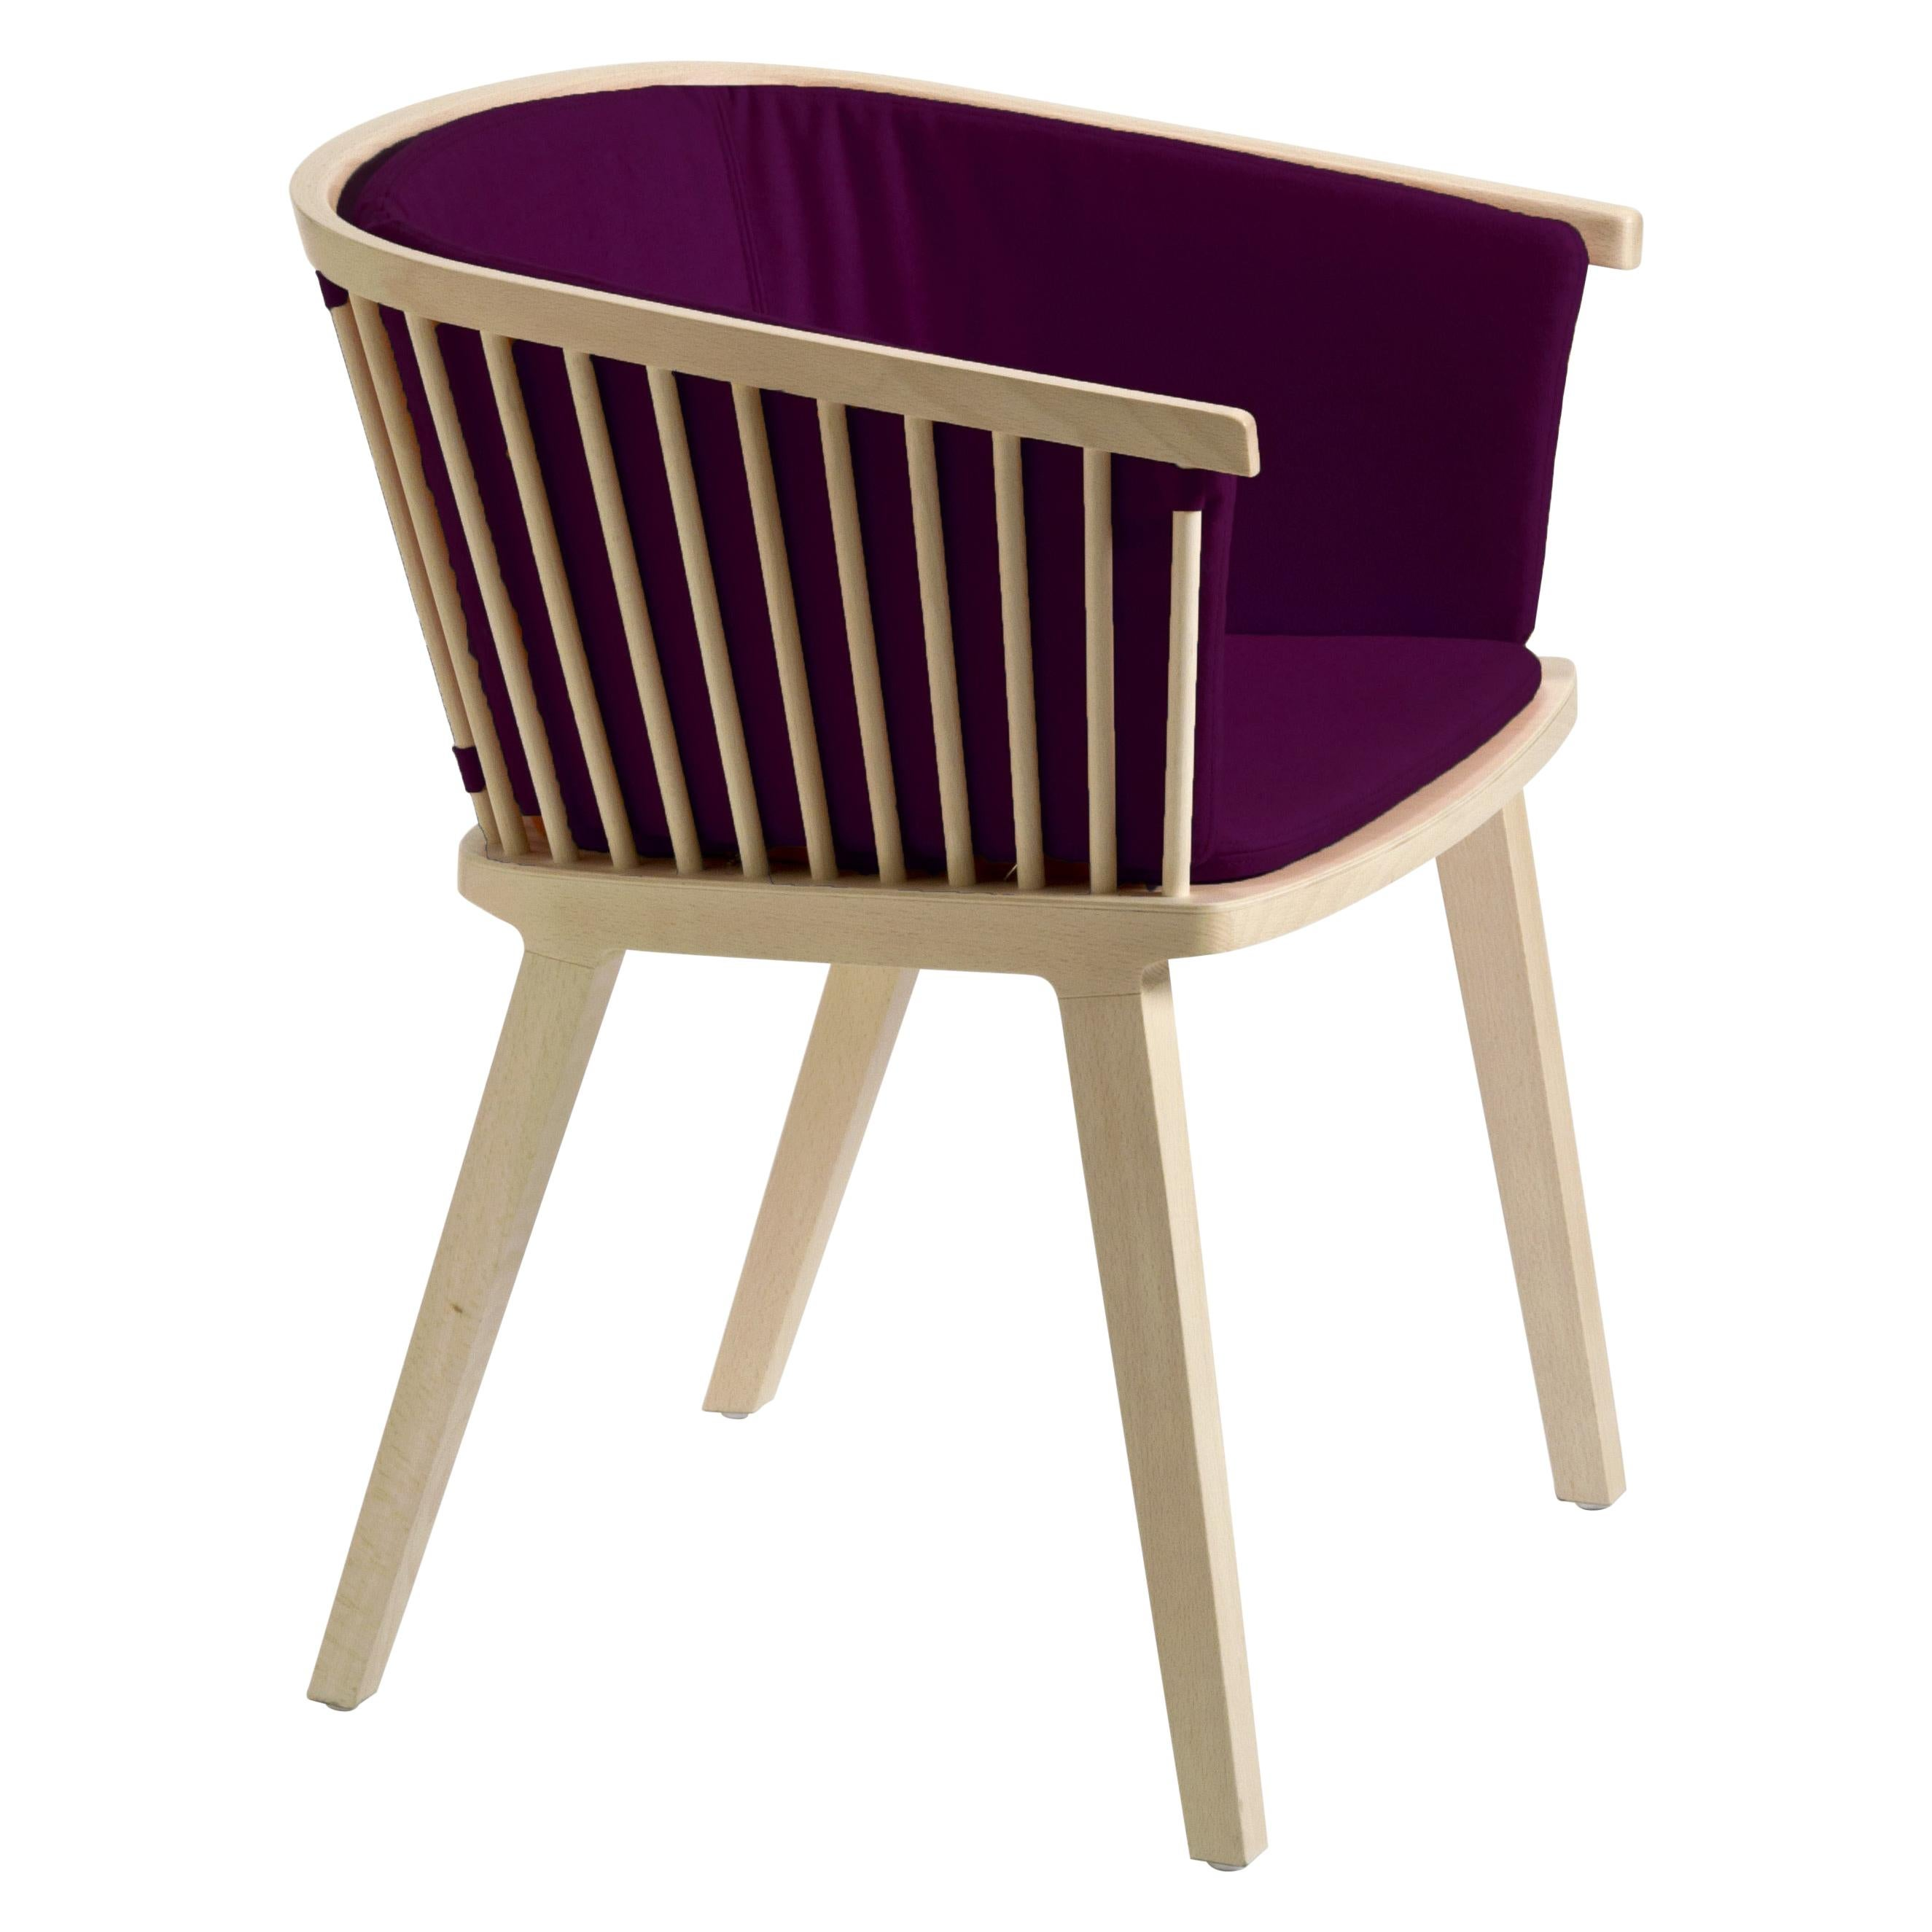 Secreto Armchair in Beechwood, Purple Velvet Cushion, Made in Italy